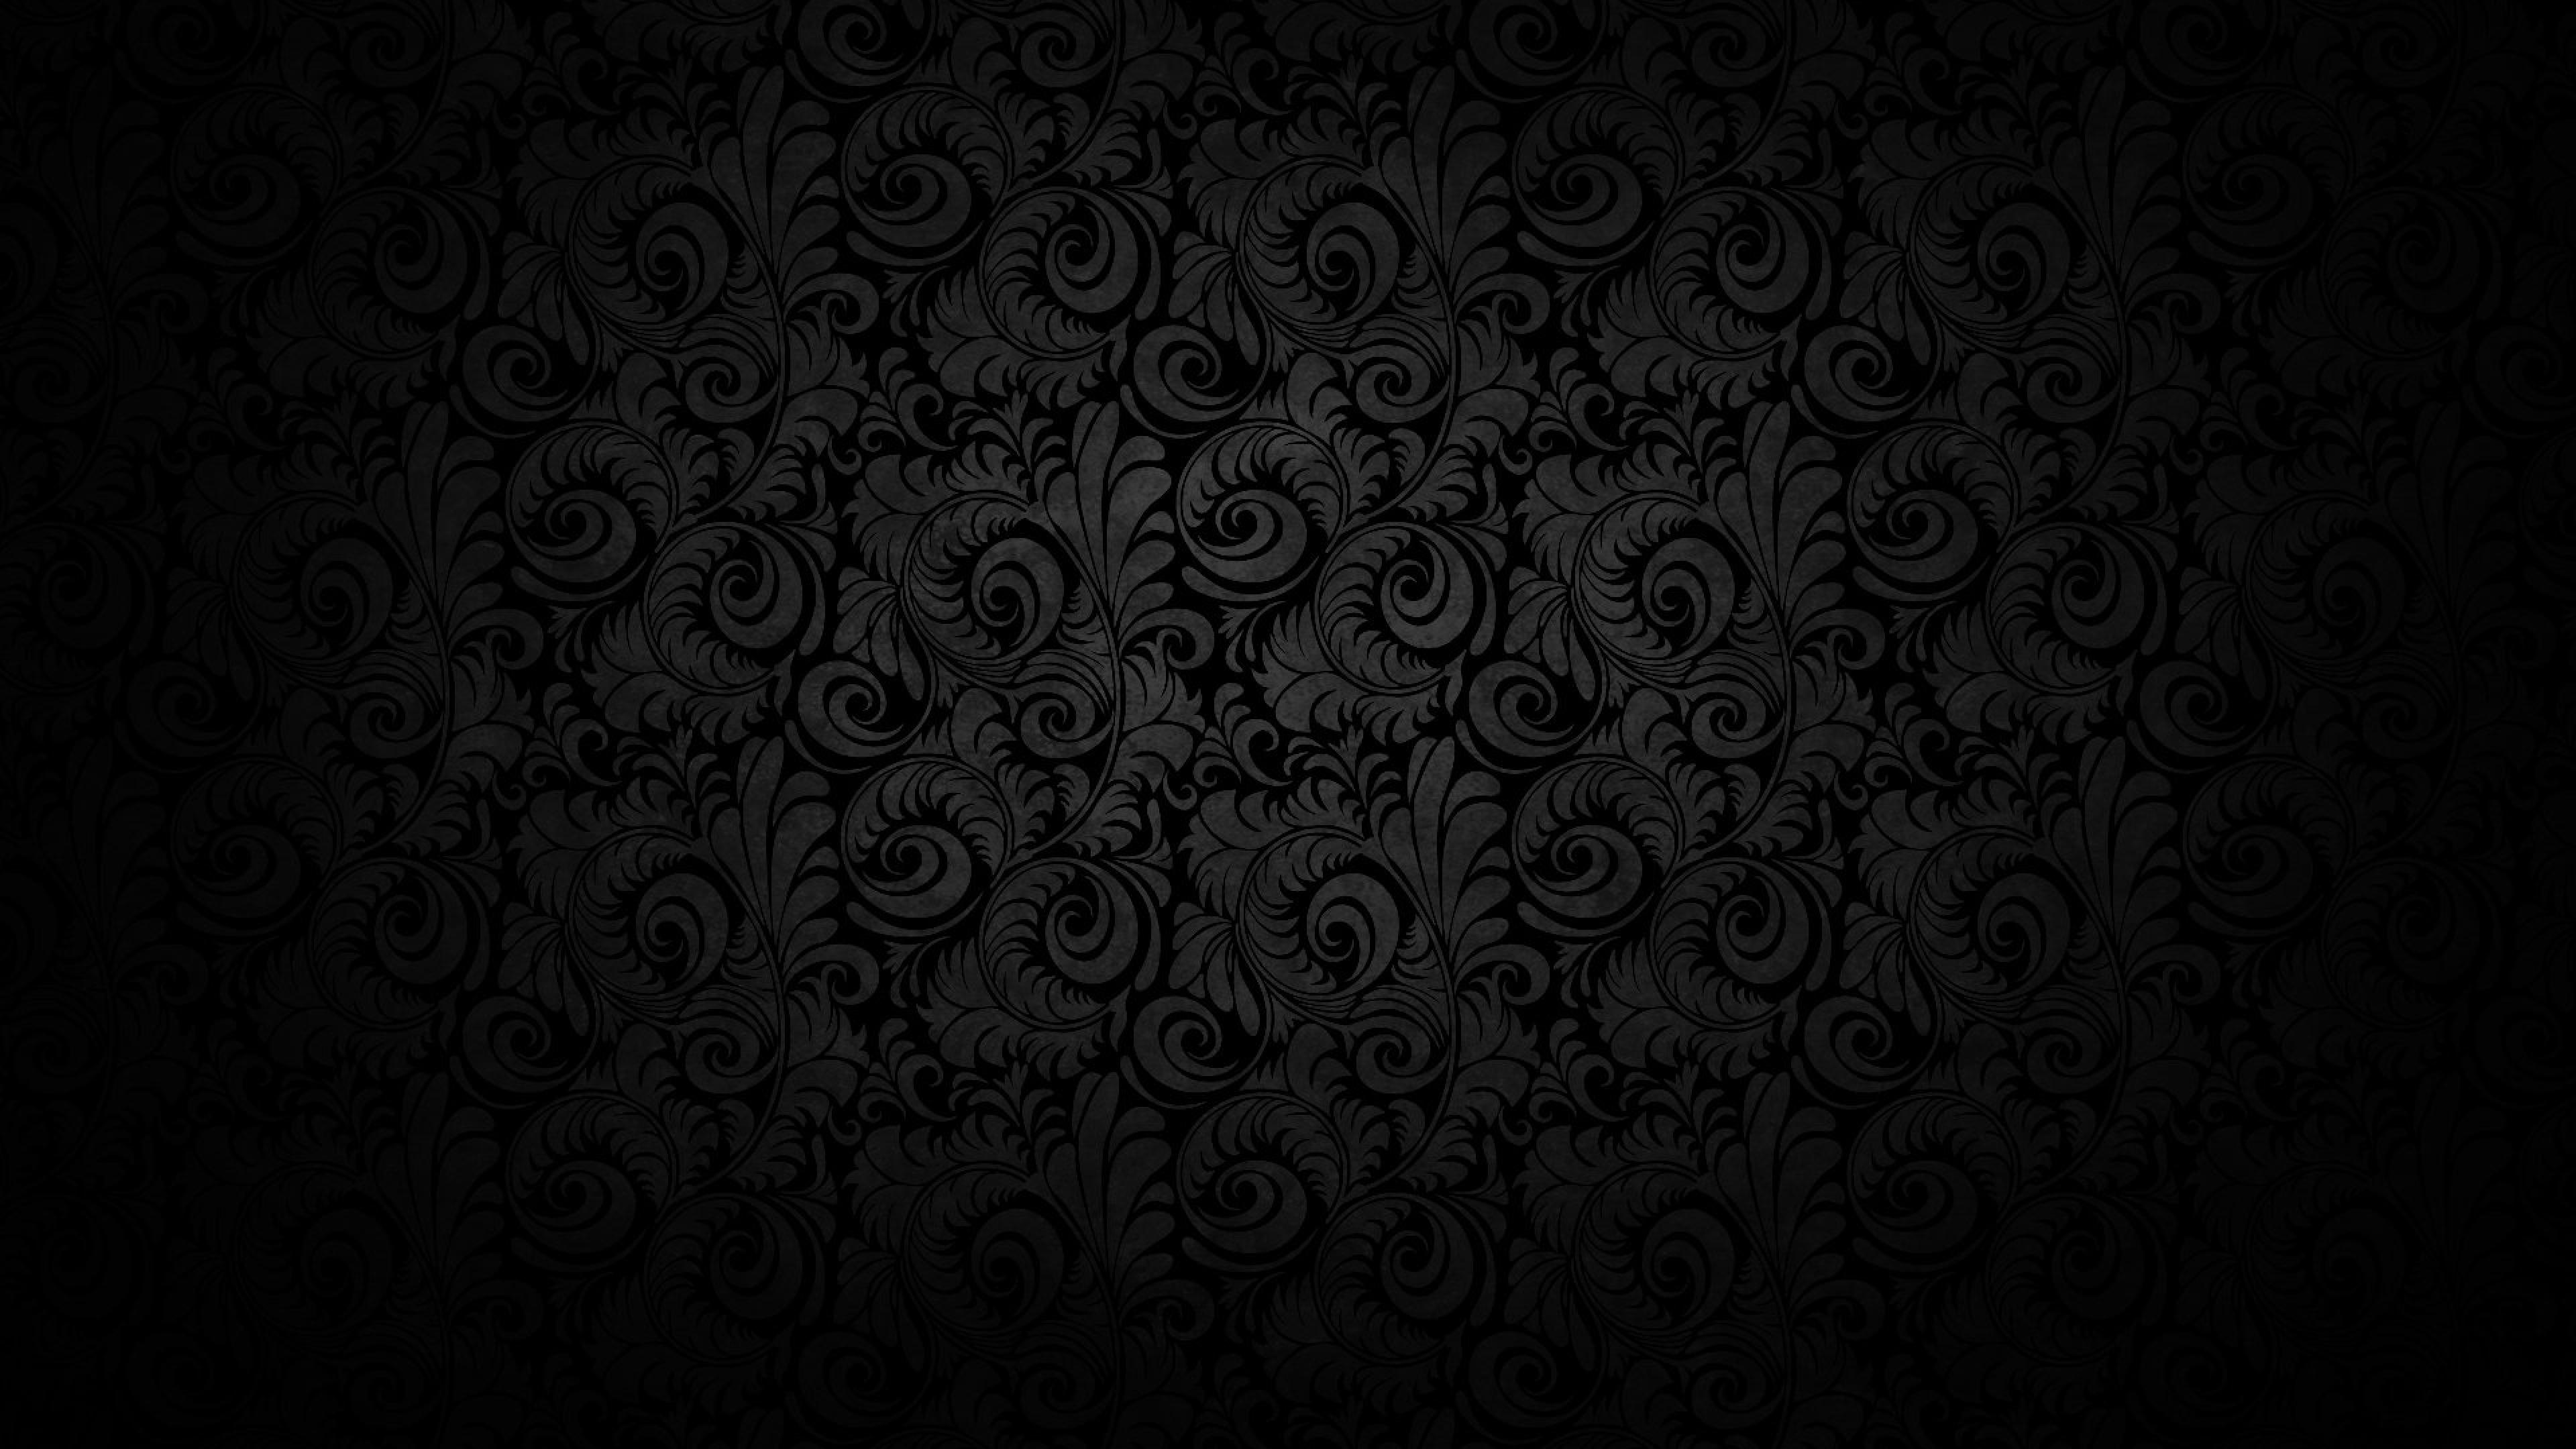 background Pattern Light Texture Wallpaper Background 4K Ultra HD 3840x2160